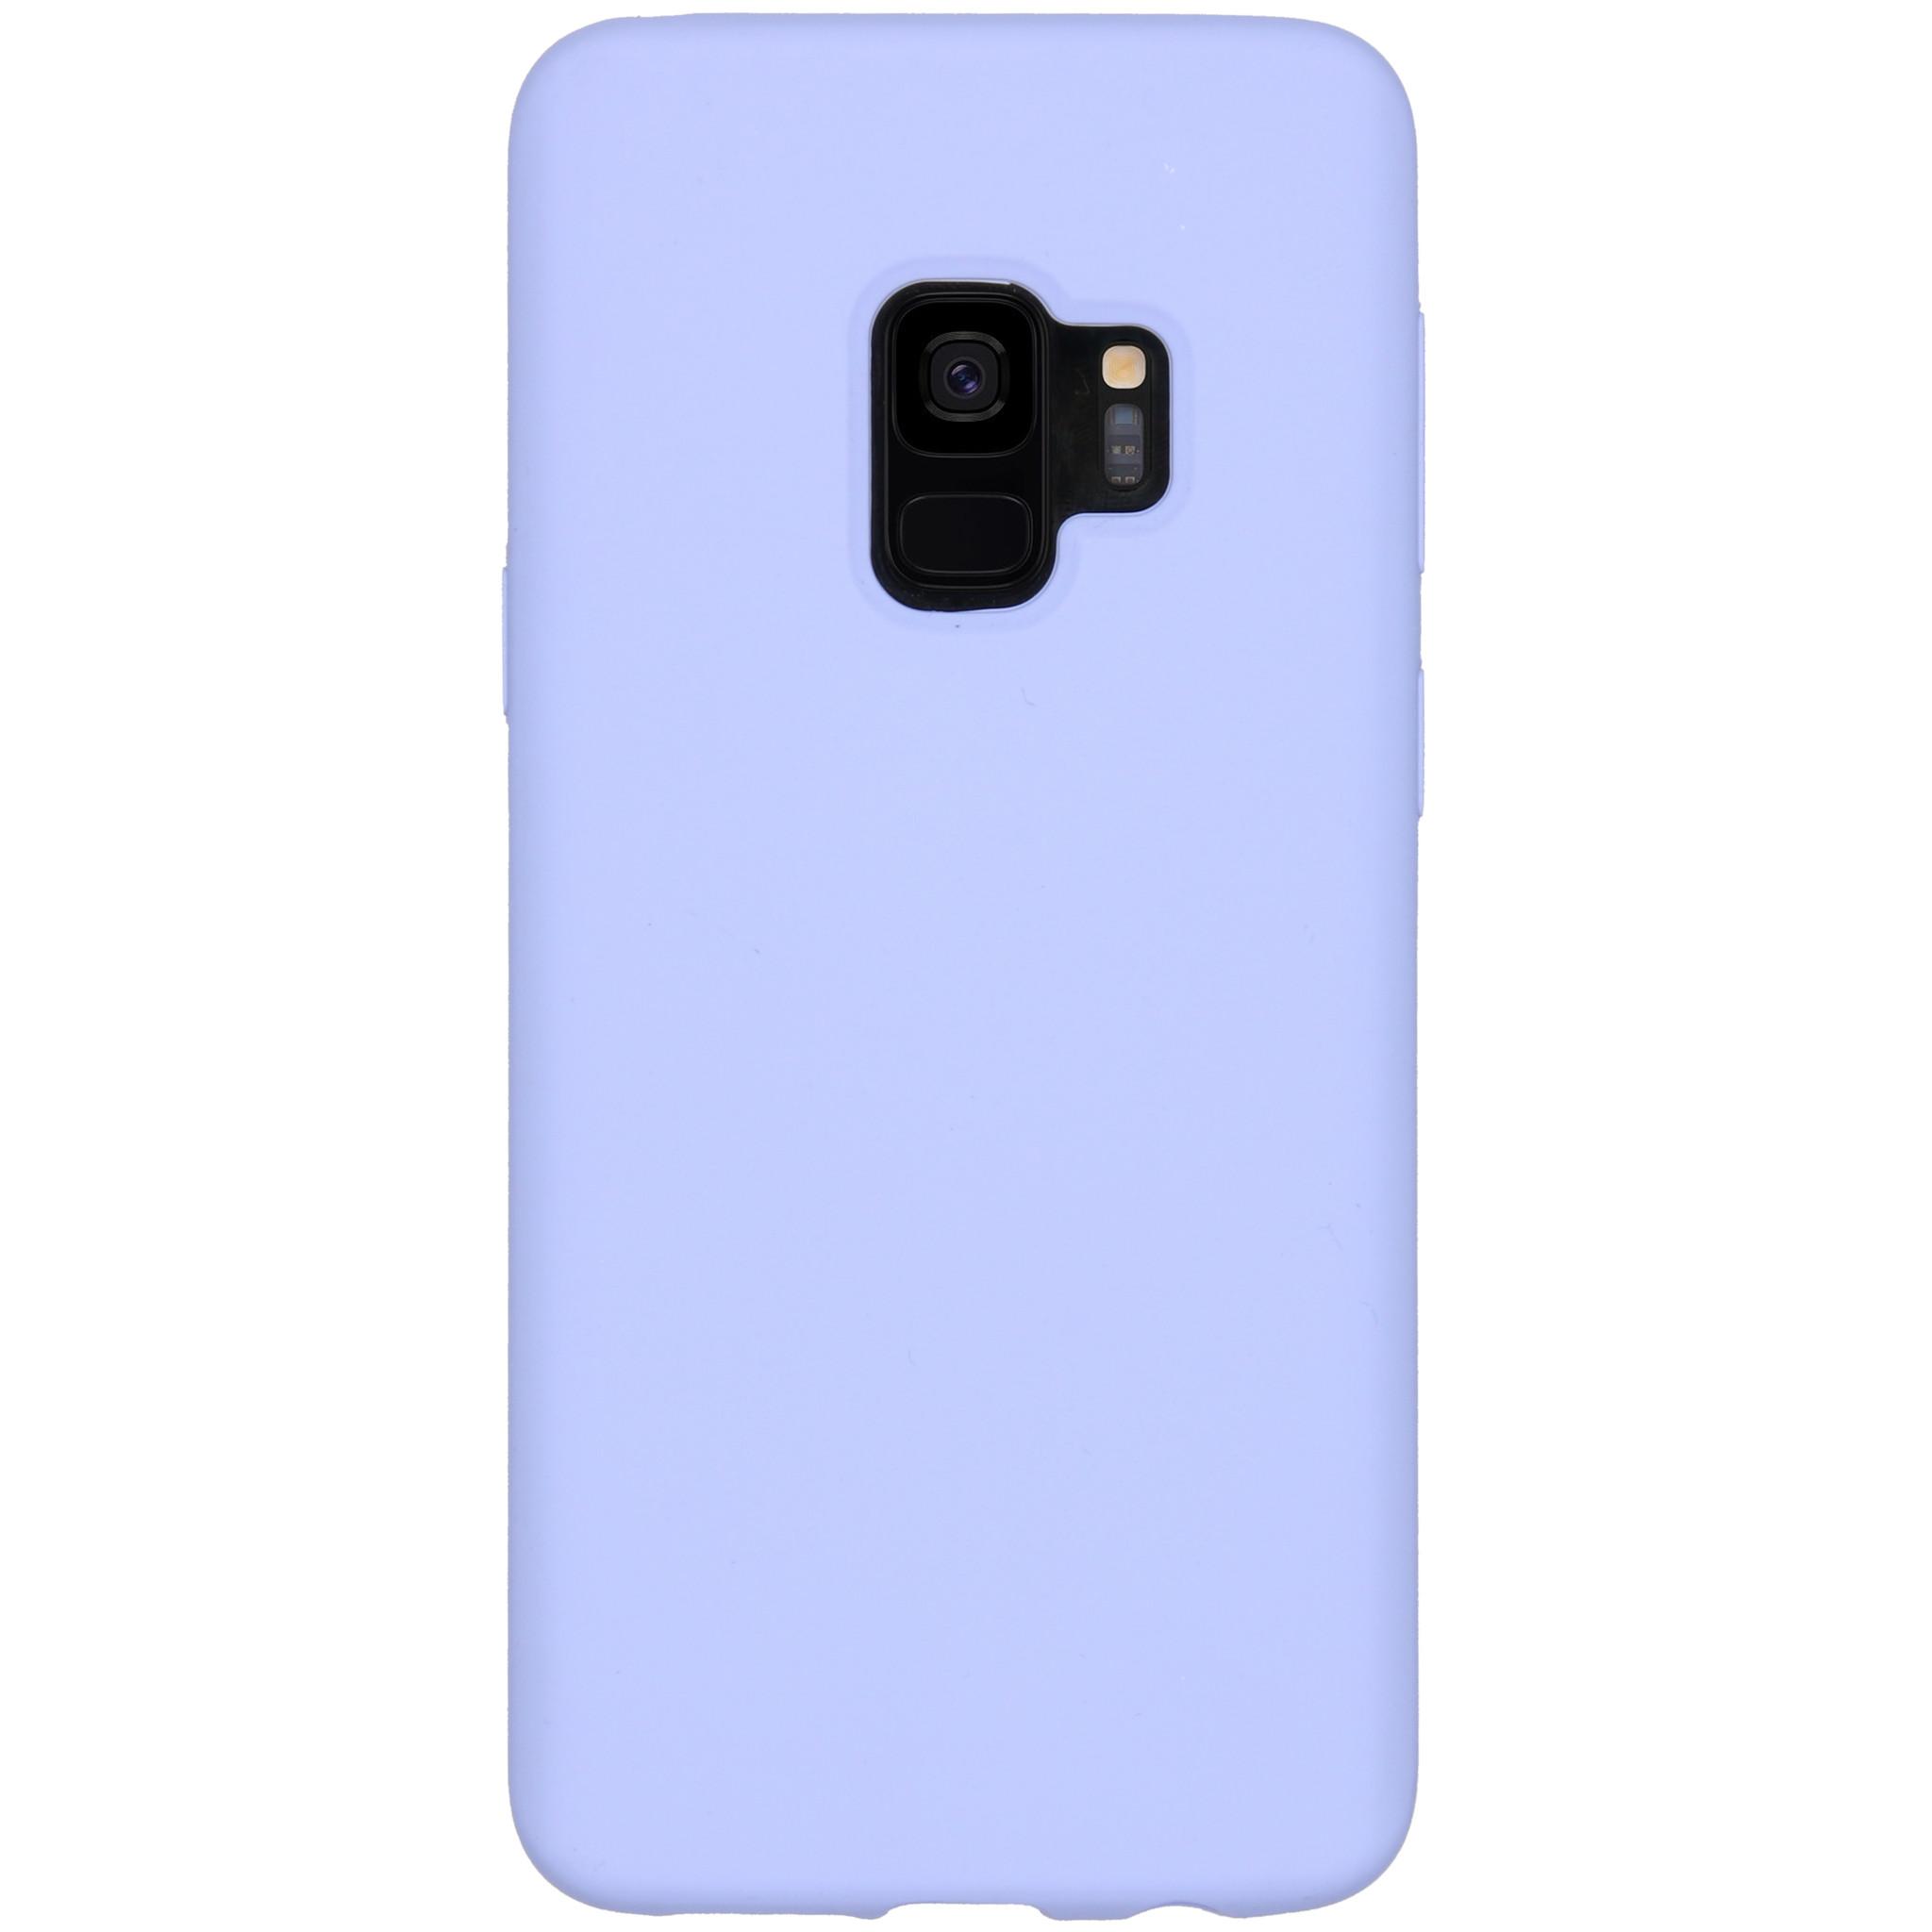 Accezz Liquid Silikoncase Lila für das Samsung Galaxy S9